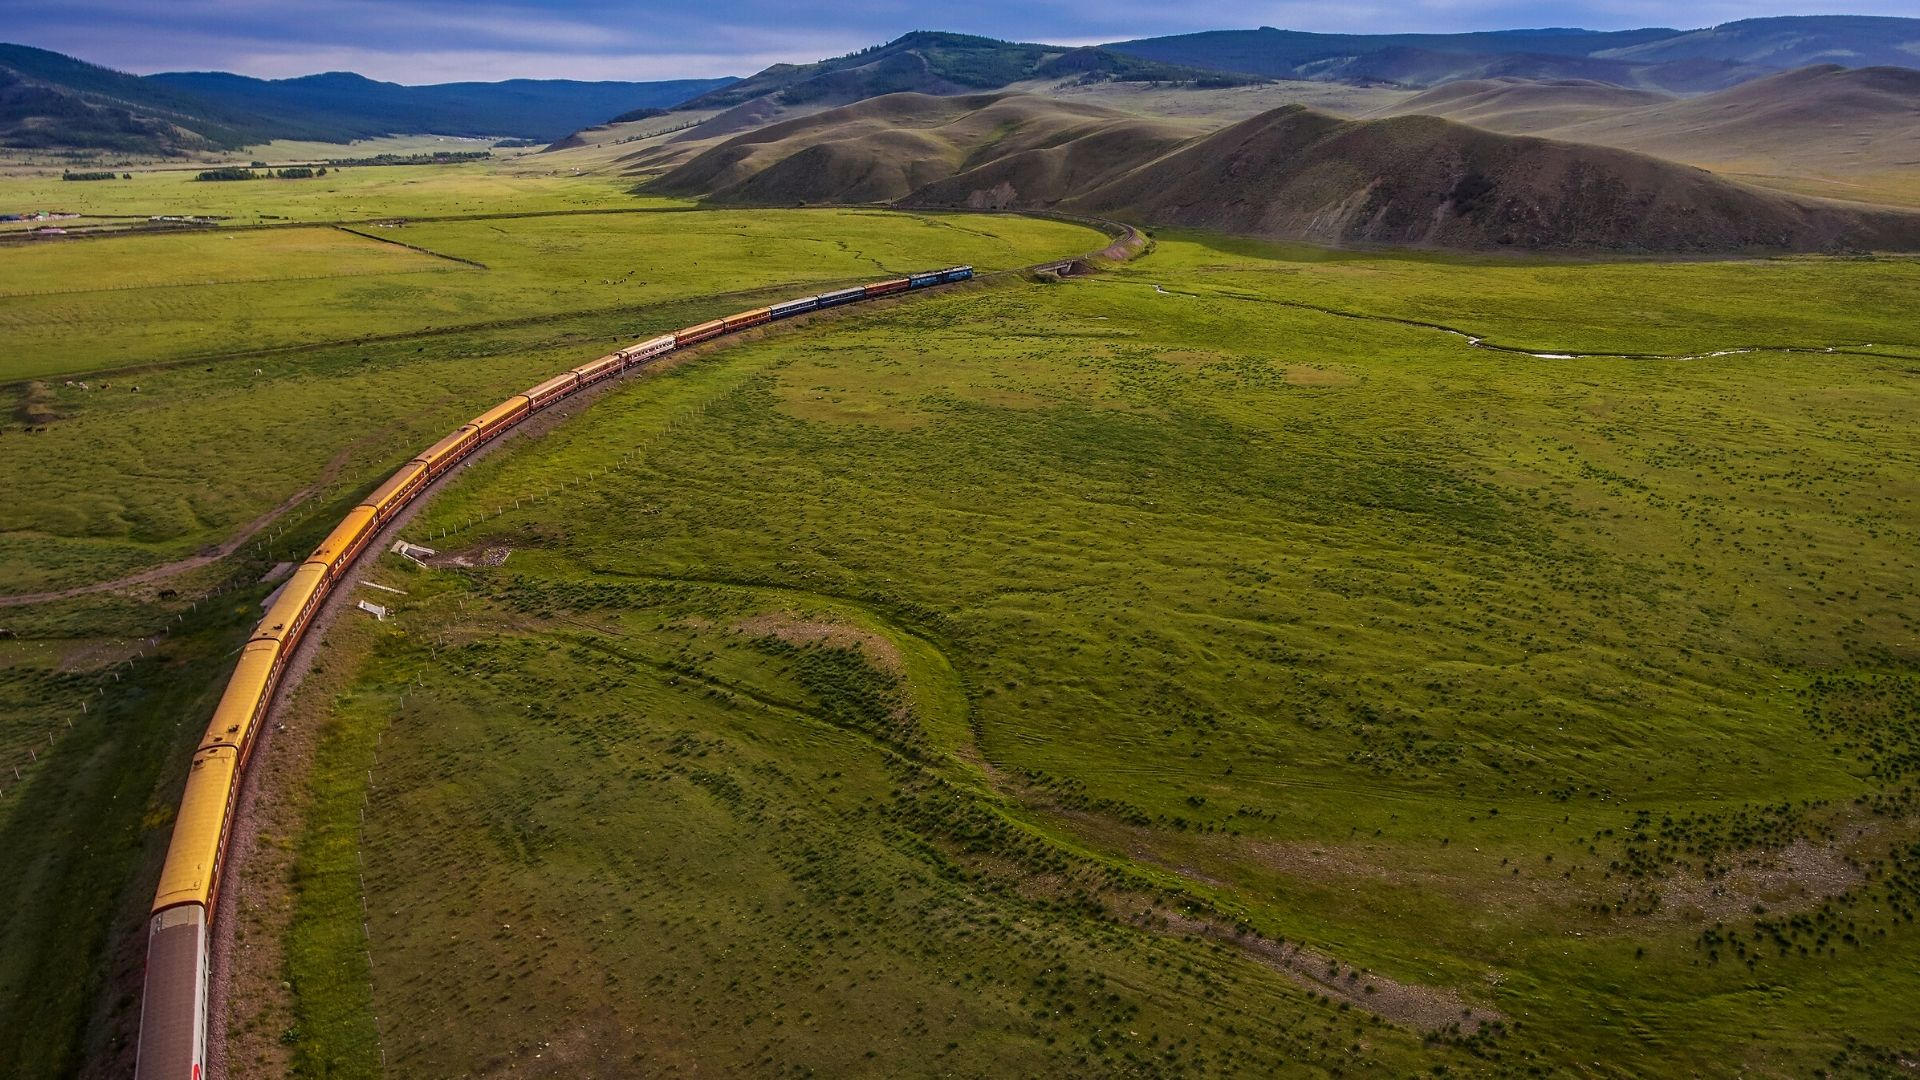 The Iconic Trans-Siberian Railway